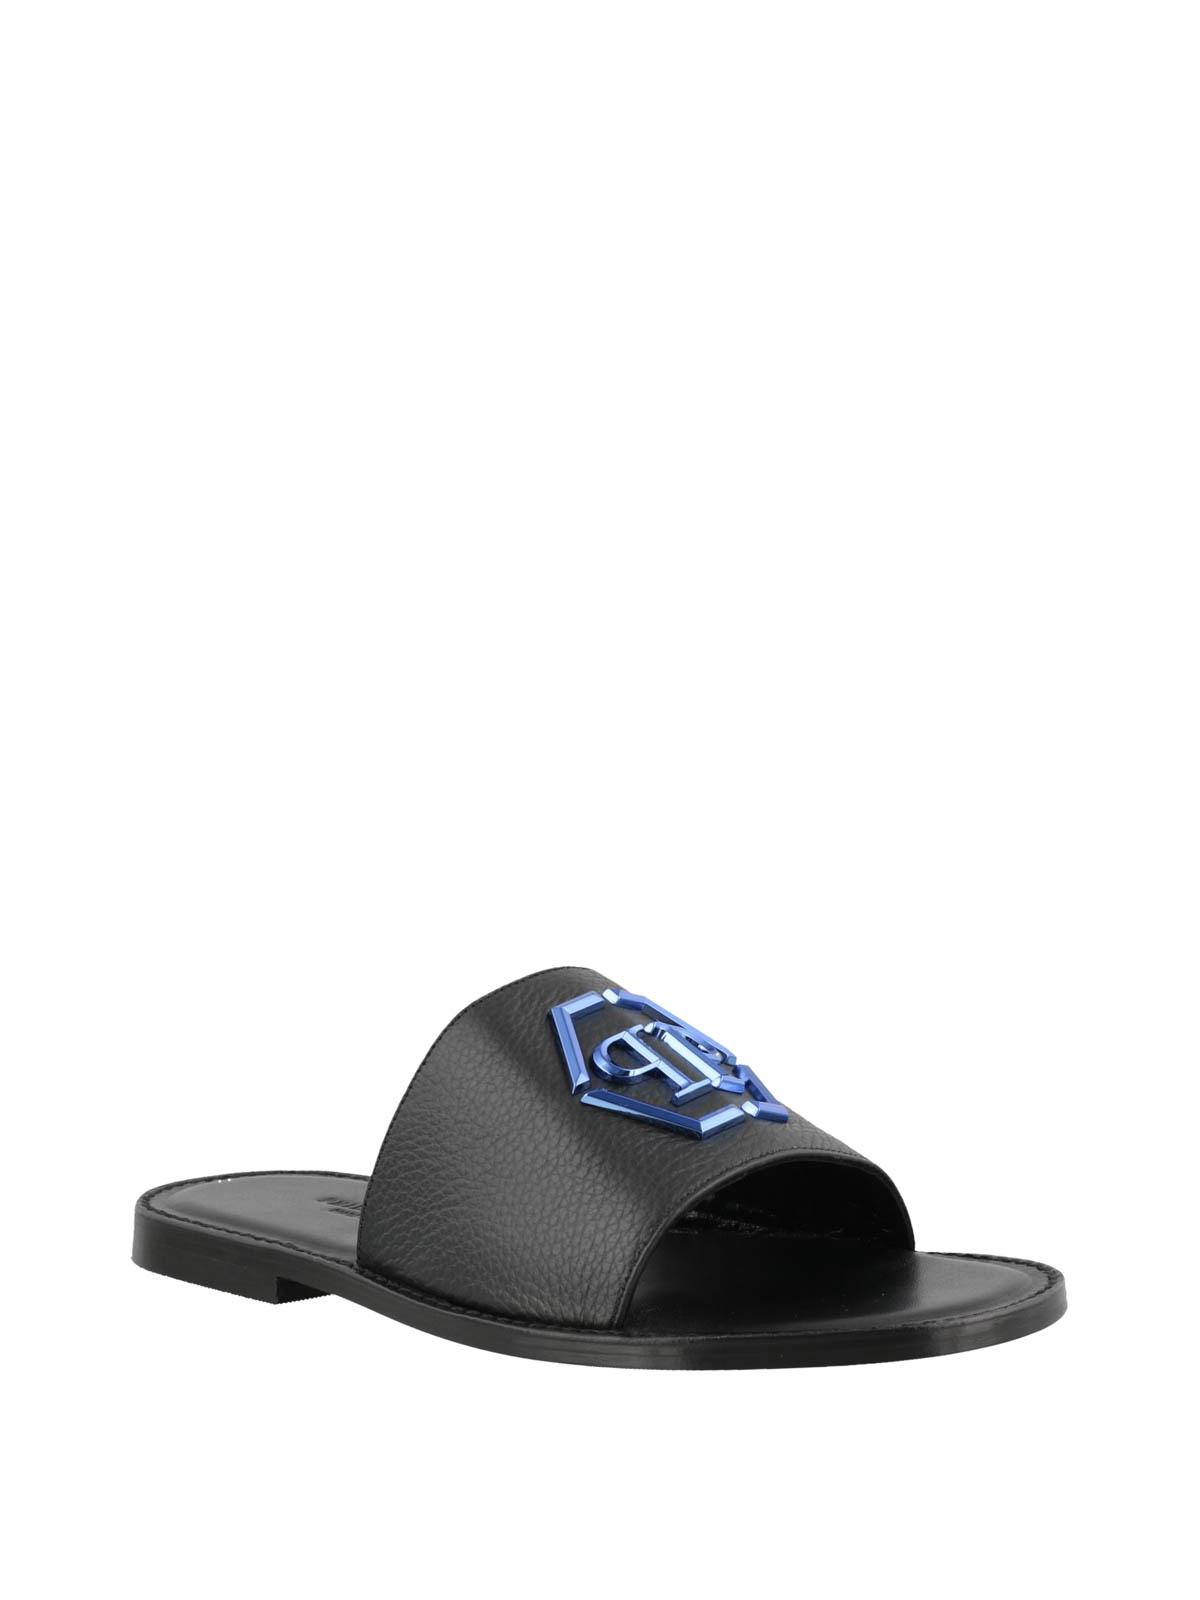 PHILIPP PLEIN  sandali online - Sandali piatti neri in pelle con logo blu 19a4864cca6